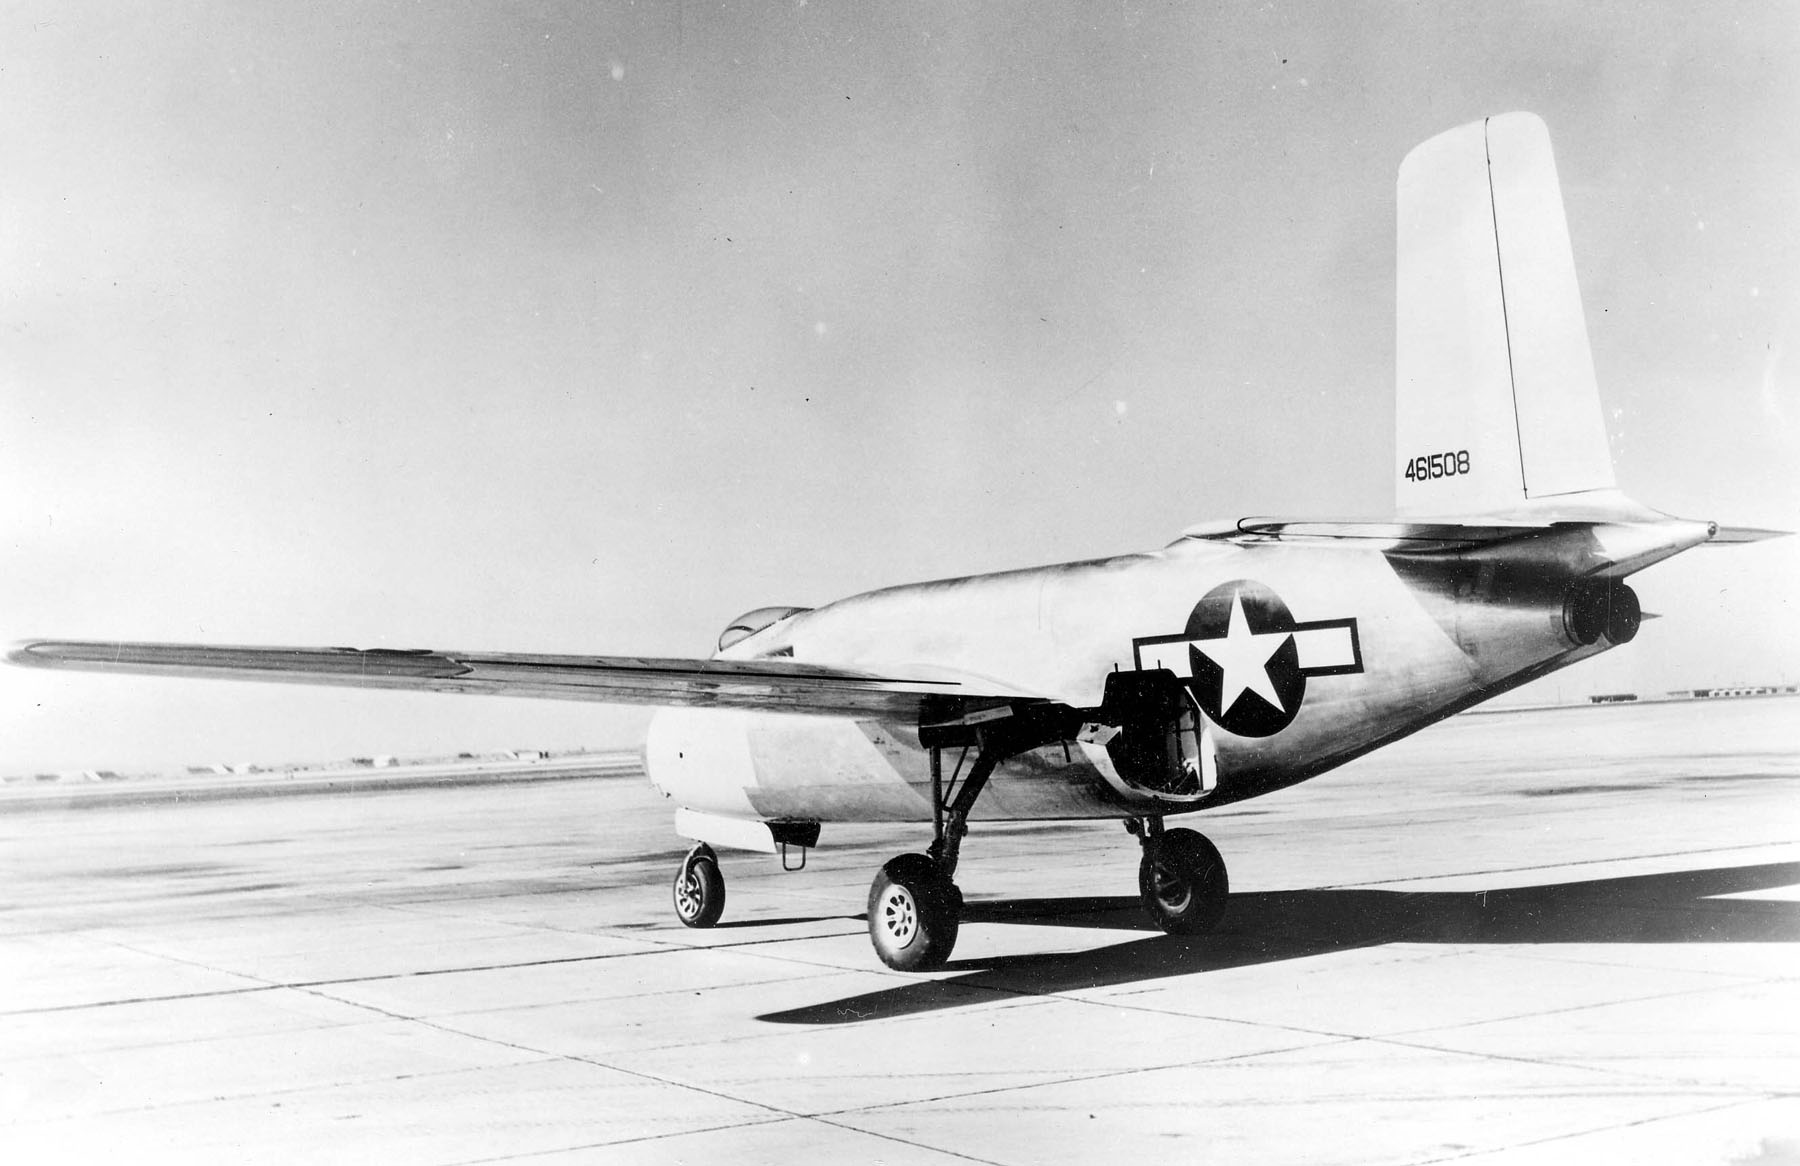 Douglas XB-43 rear.jpg